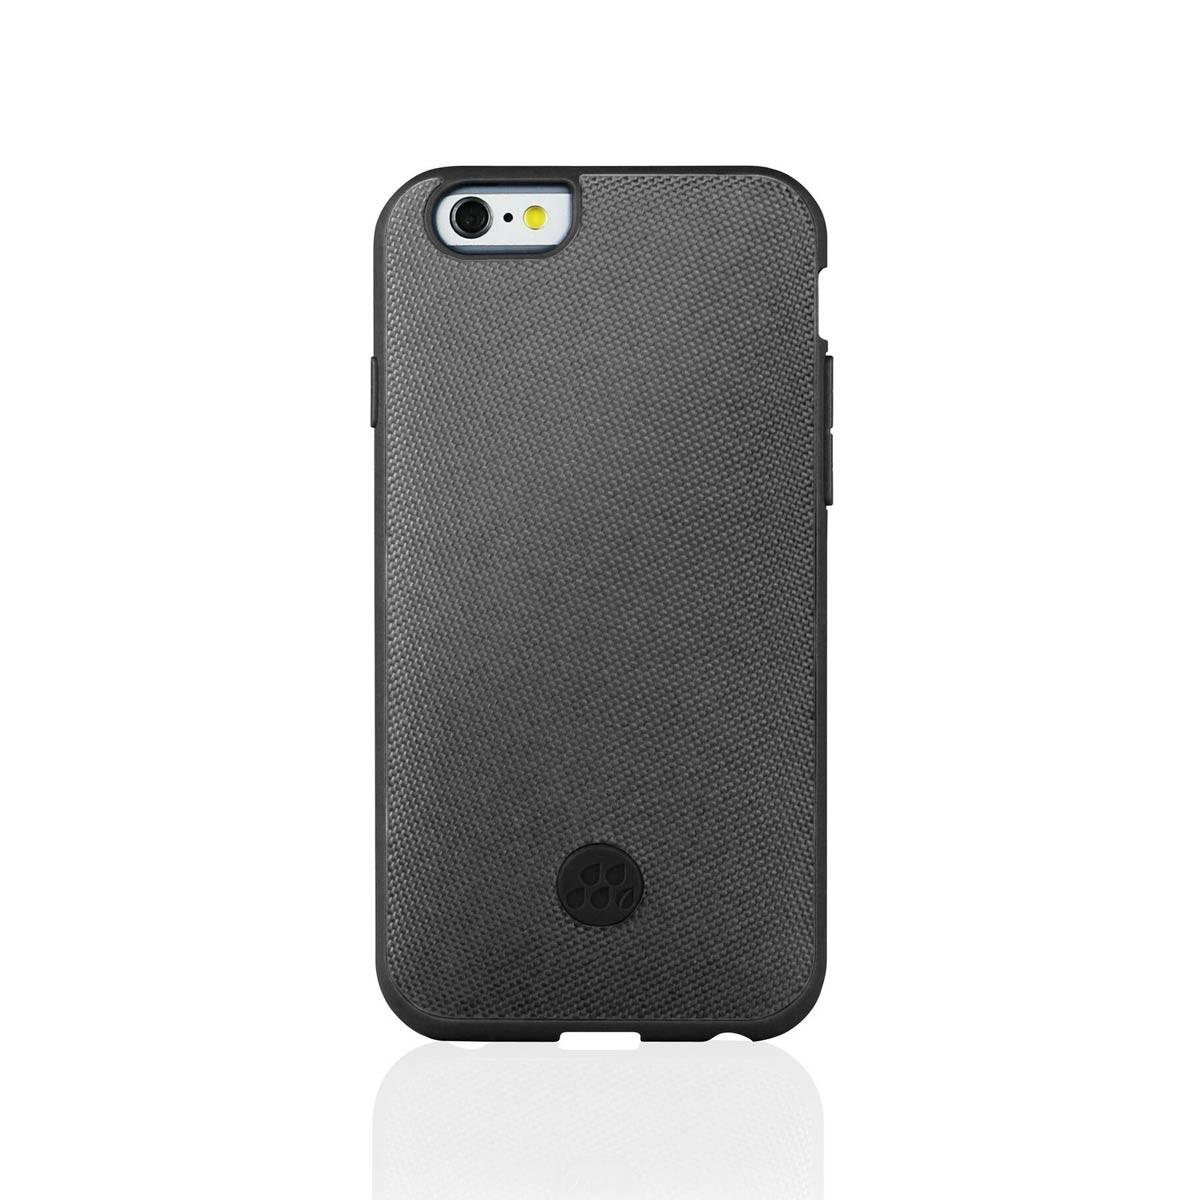 Evutec - Ballistic Nylon ST for iPhone 6/6s - Grey